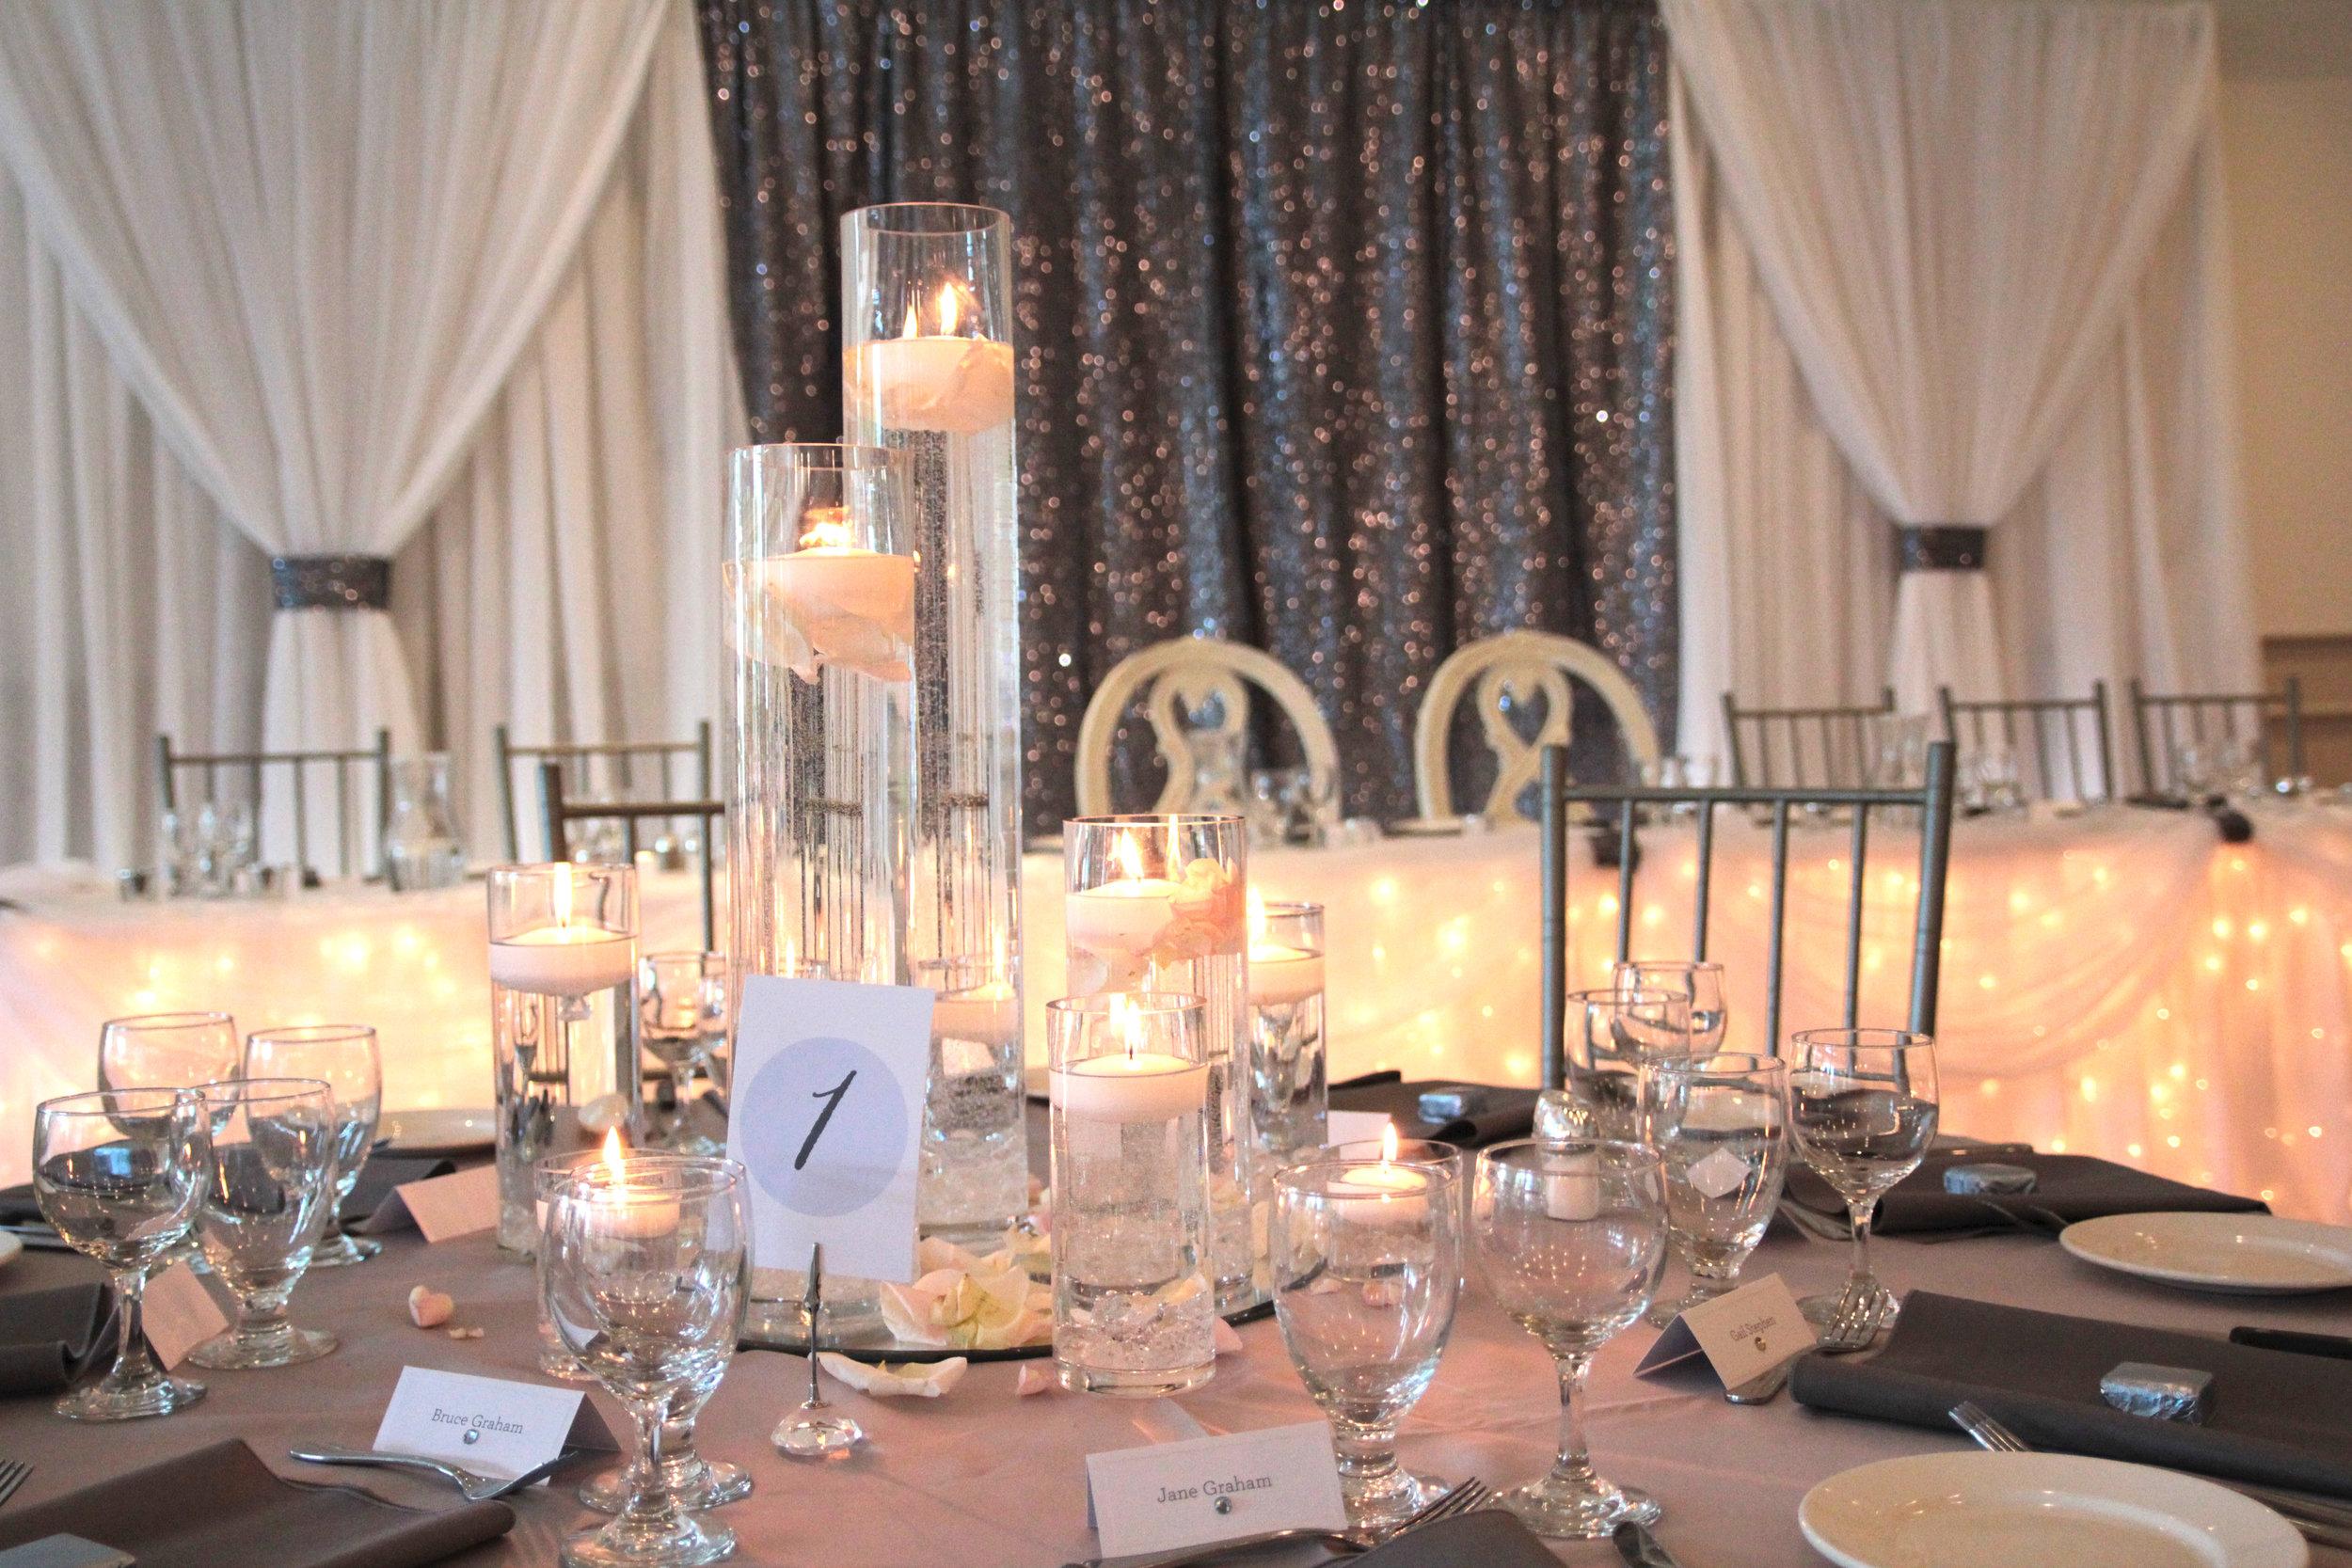 ballroom-reception-backdrop-sequin-candles-bride-groom-chairs.jpg